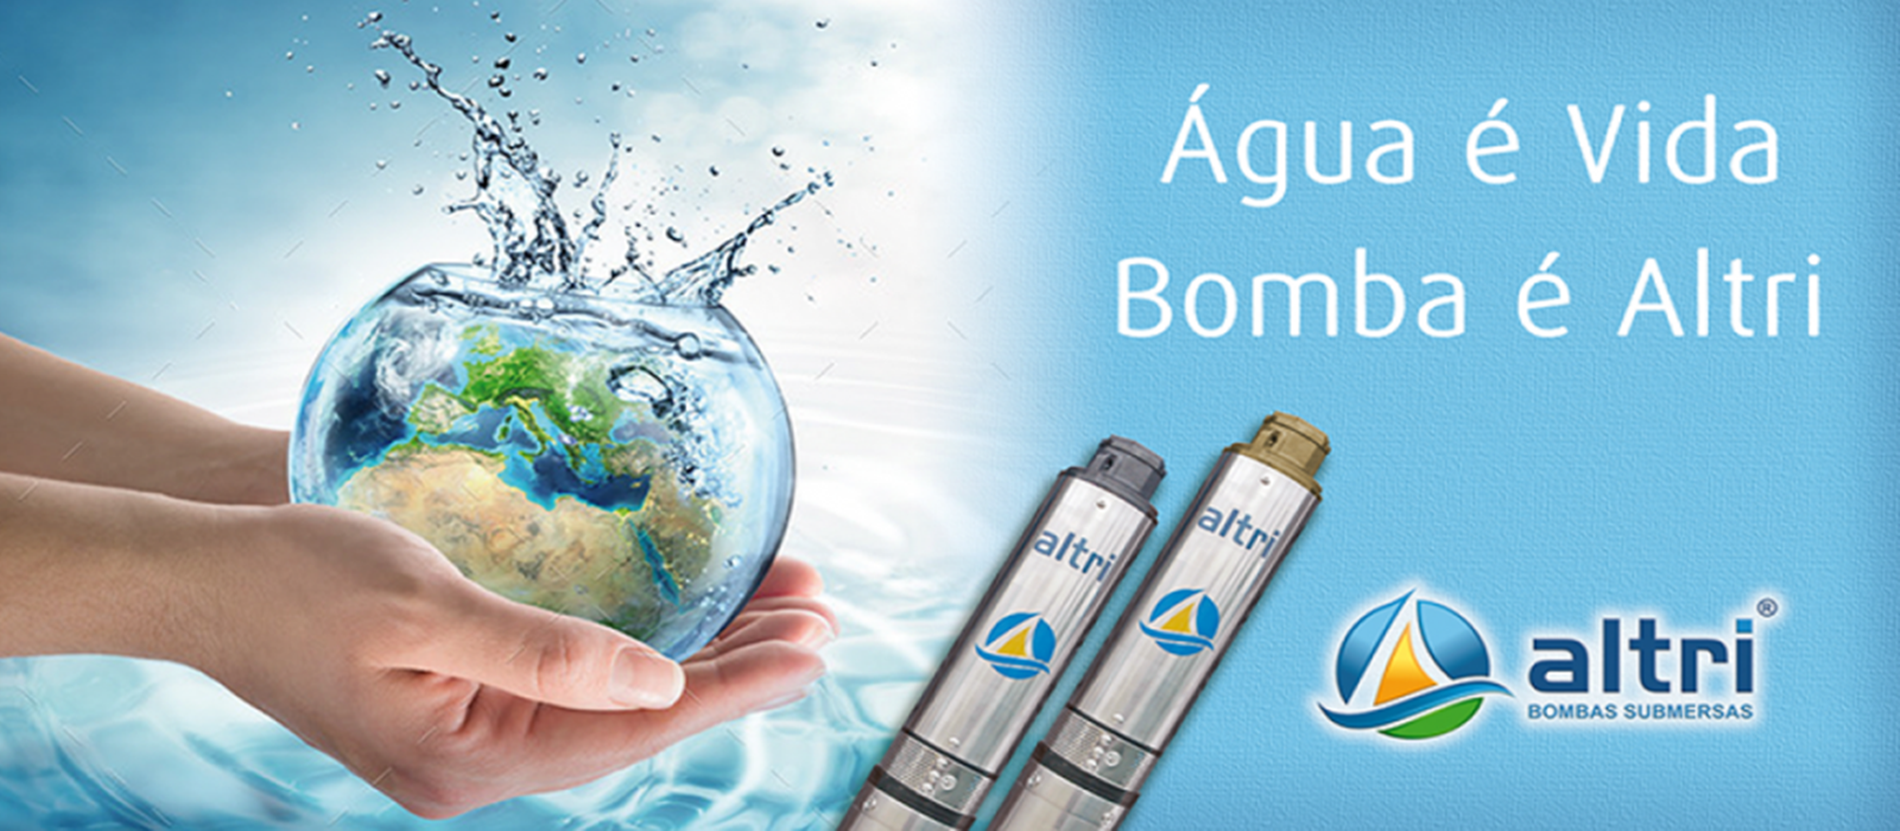 agua é vida bomba é altri